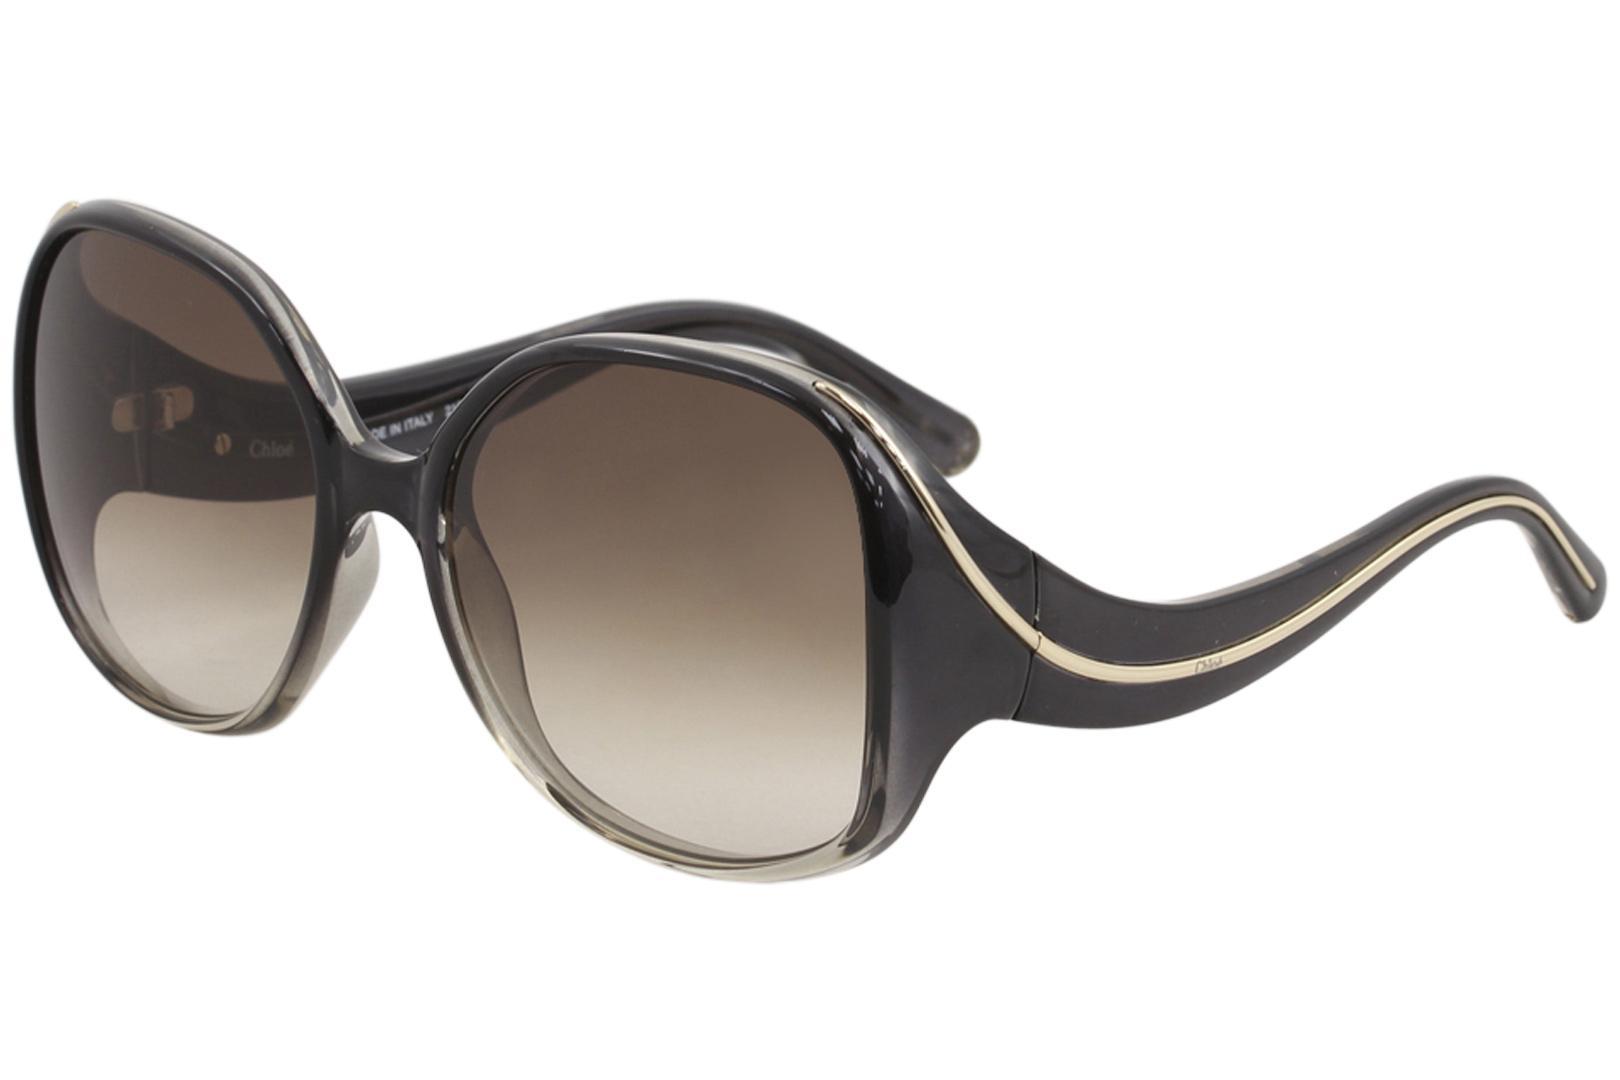 b4a670d3 Chloe Women's CE728S CE/728/S Fashion Square Sunglasses